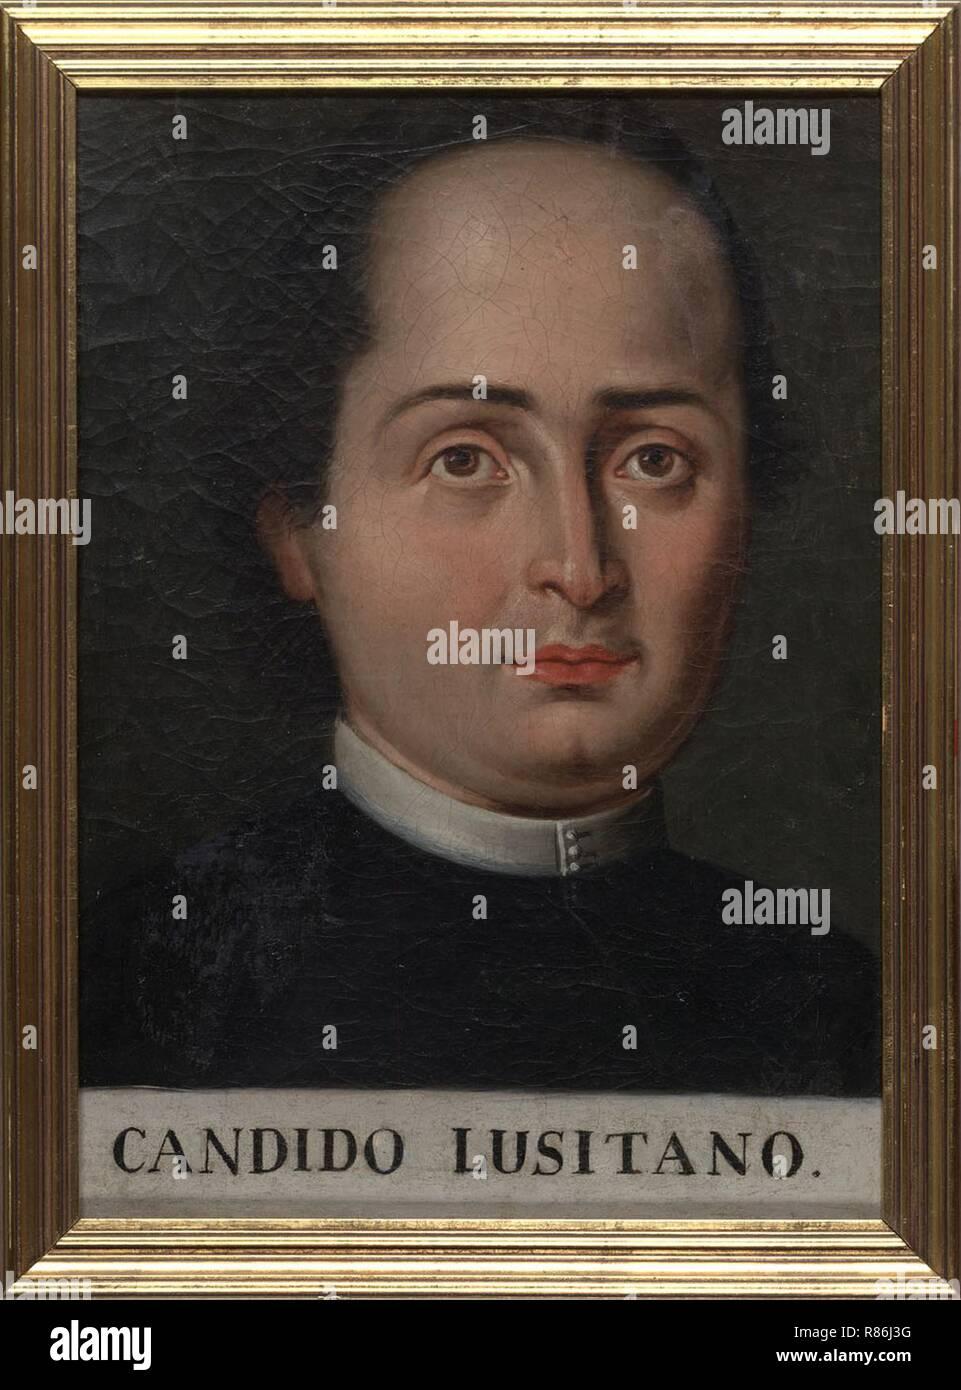 Candido Lusitano (BNP Inv. 14491). - Stock Image